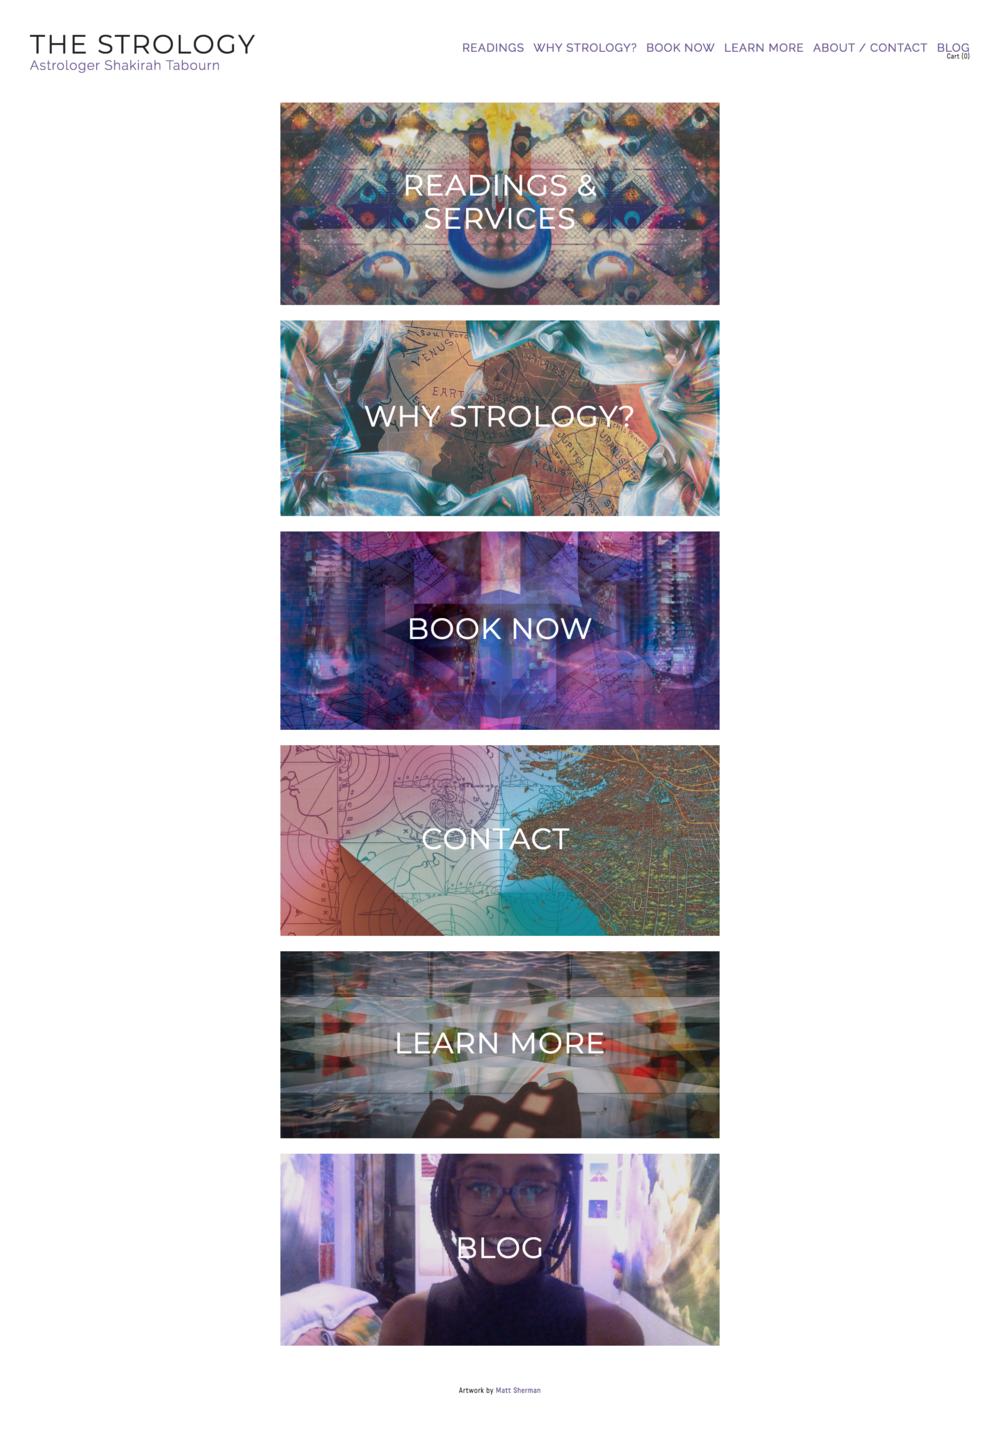 screencapture-thestrology-2018-05-07-19_19_26.png